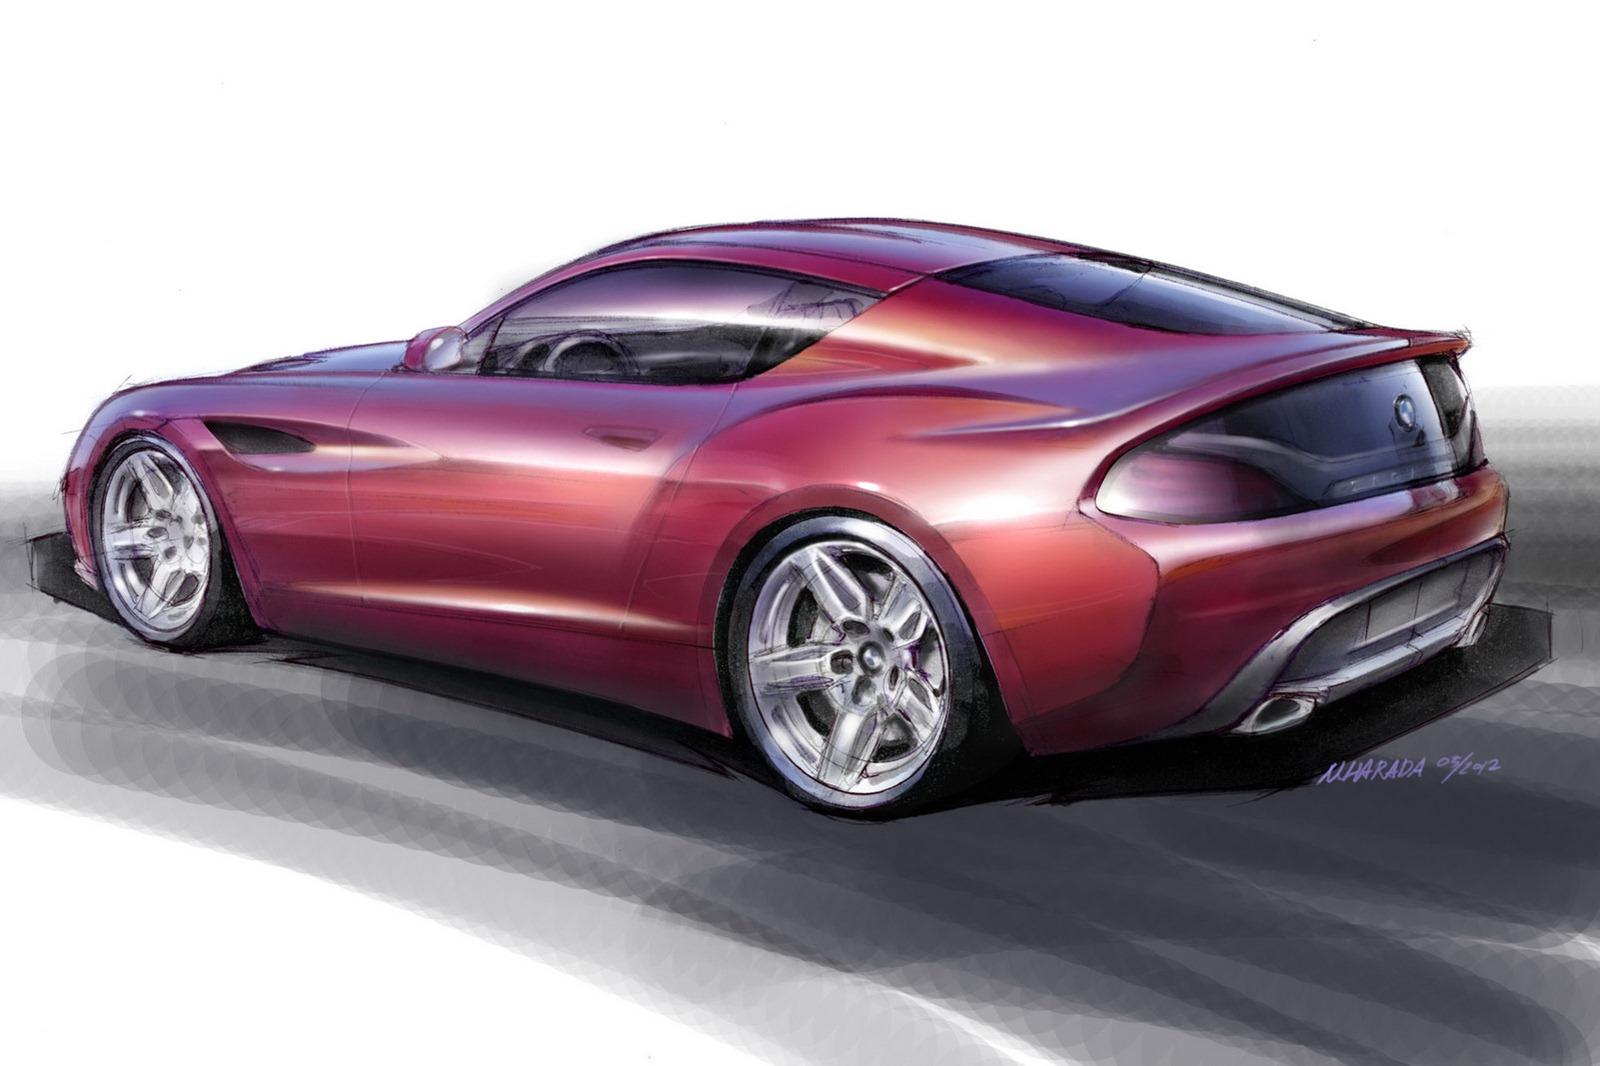 Melkyaditya Blogspot Com 2012 Bmw Z4 Zagato Coupe